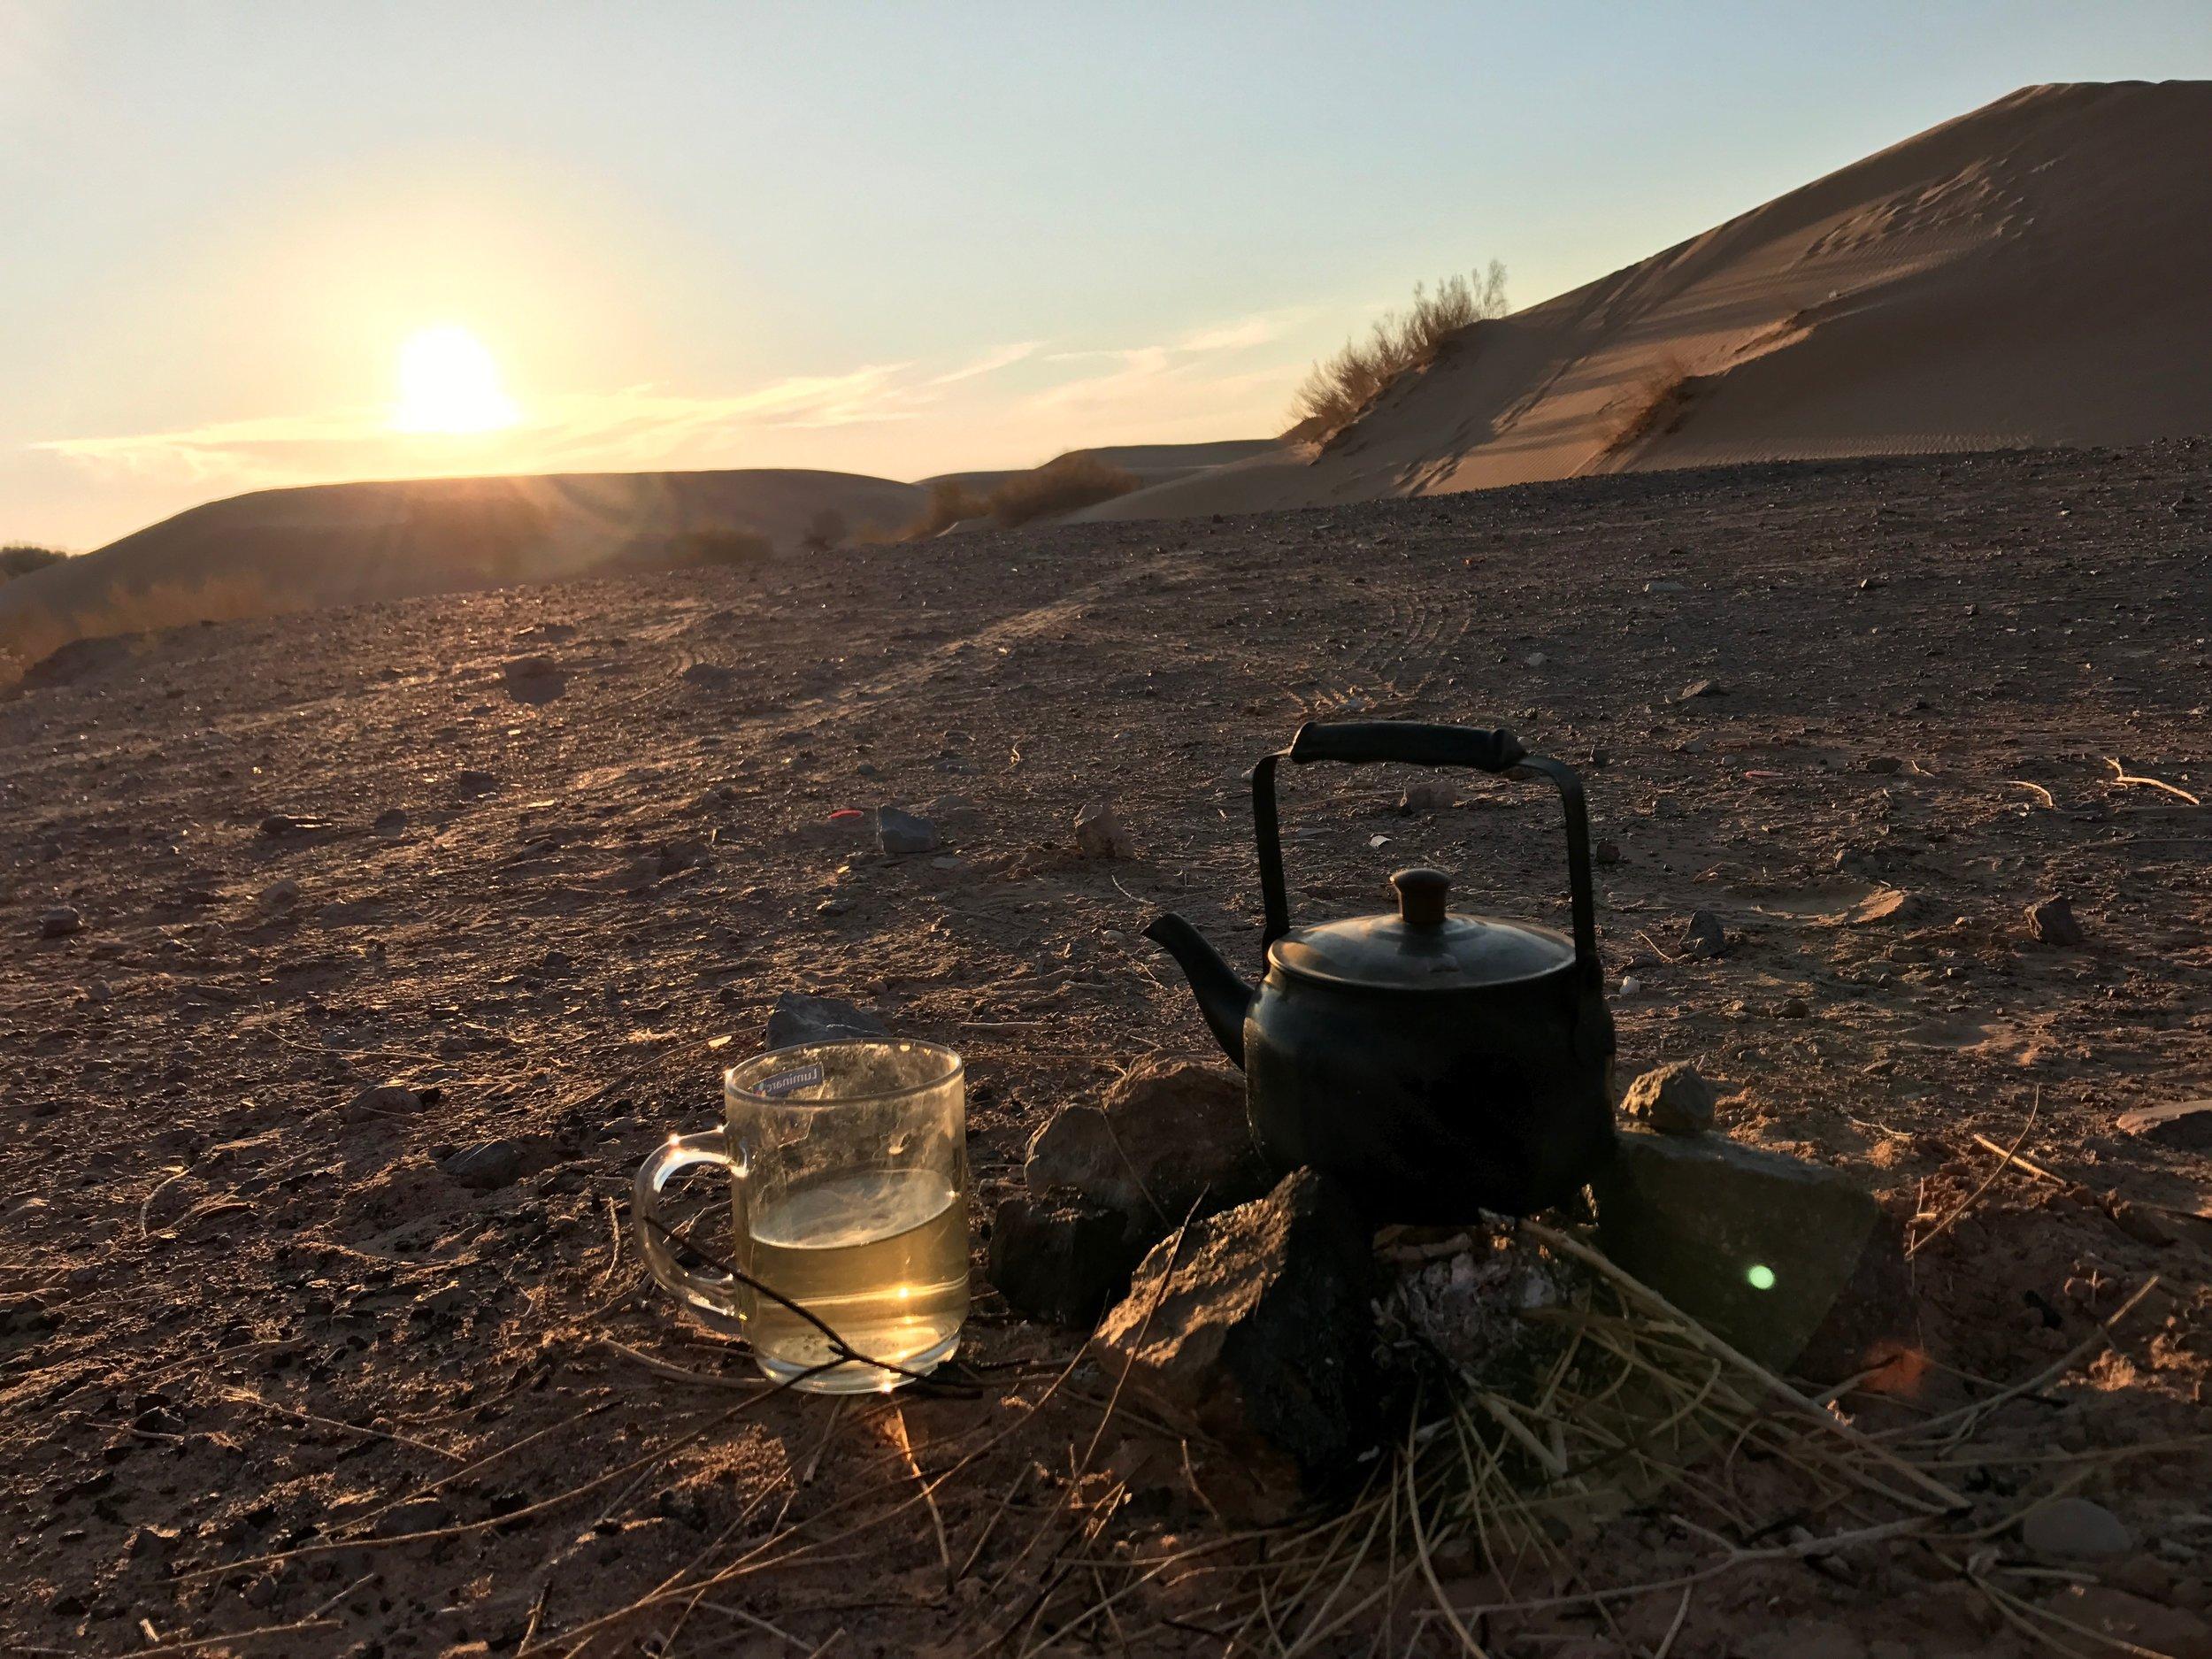 Desert tea at sunset